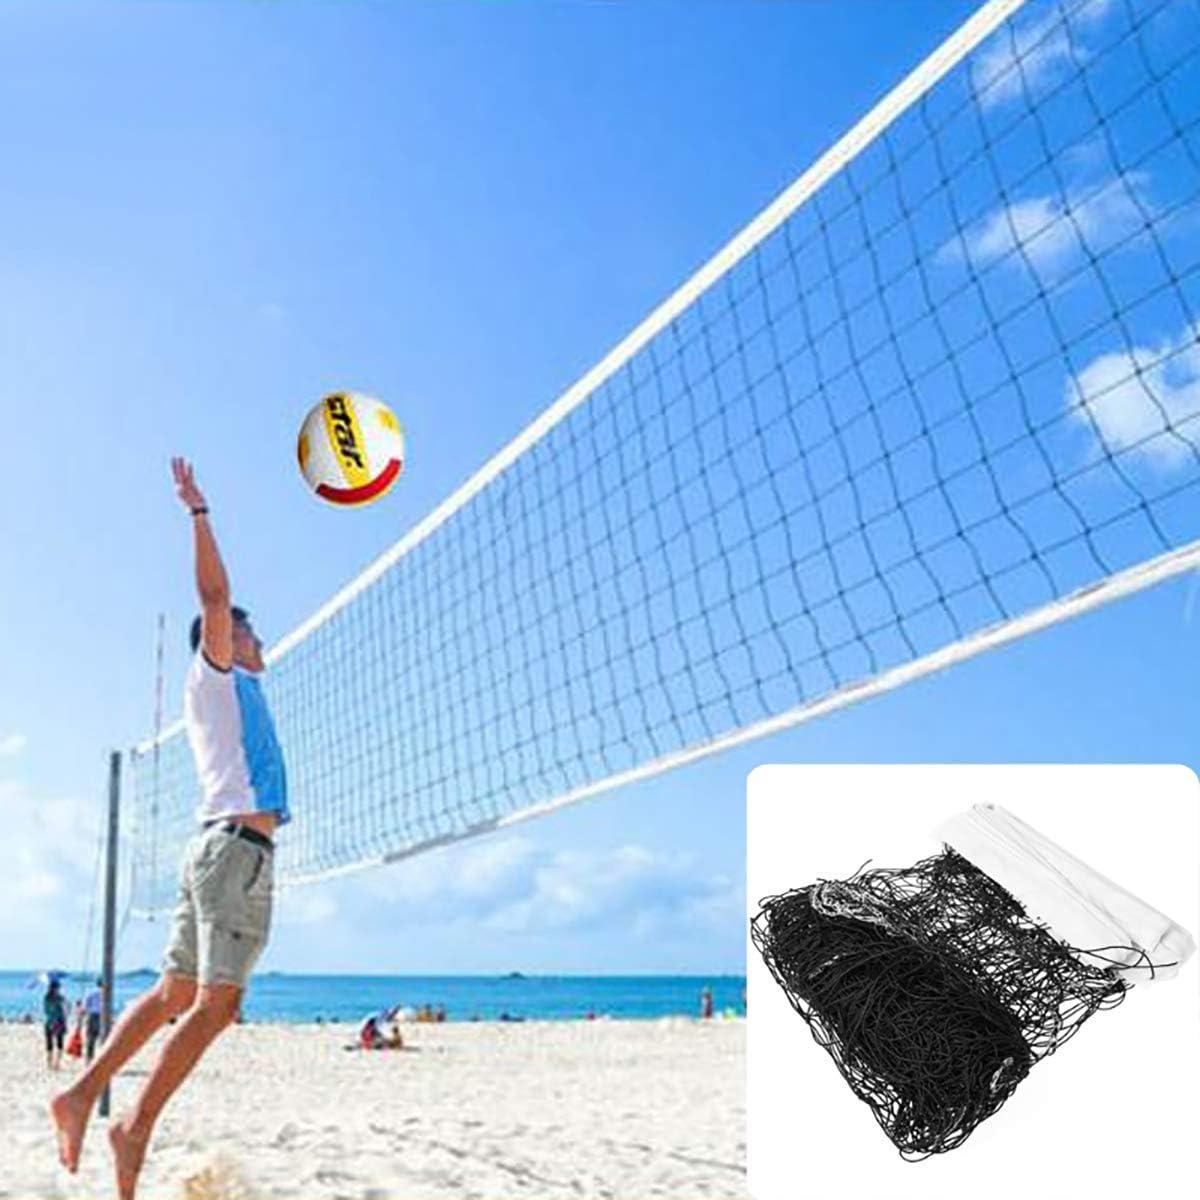 Cozylkx Volleyball Net Set Net For Tennis Volley Ball Badminton Pickleball Handball Outdoor Indoor Beach Volleyball Accessories Nets Amazon Canada